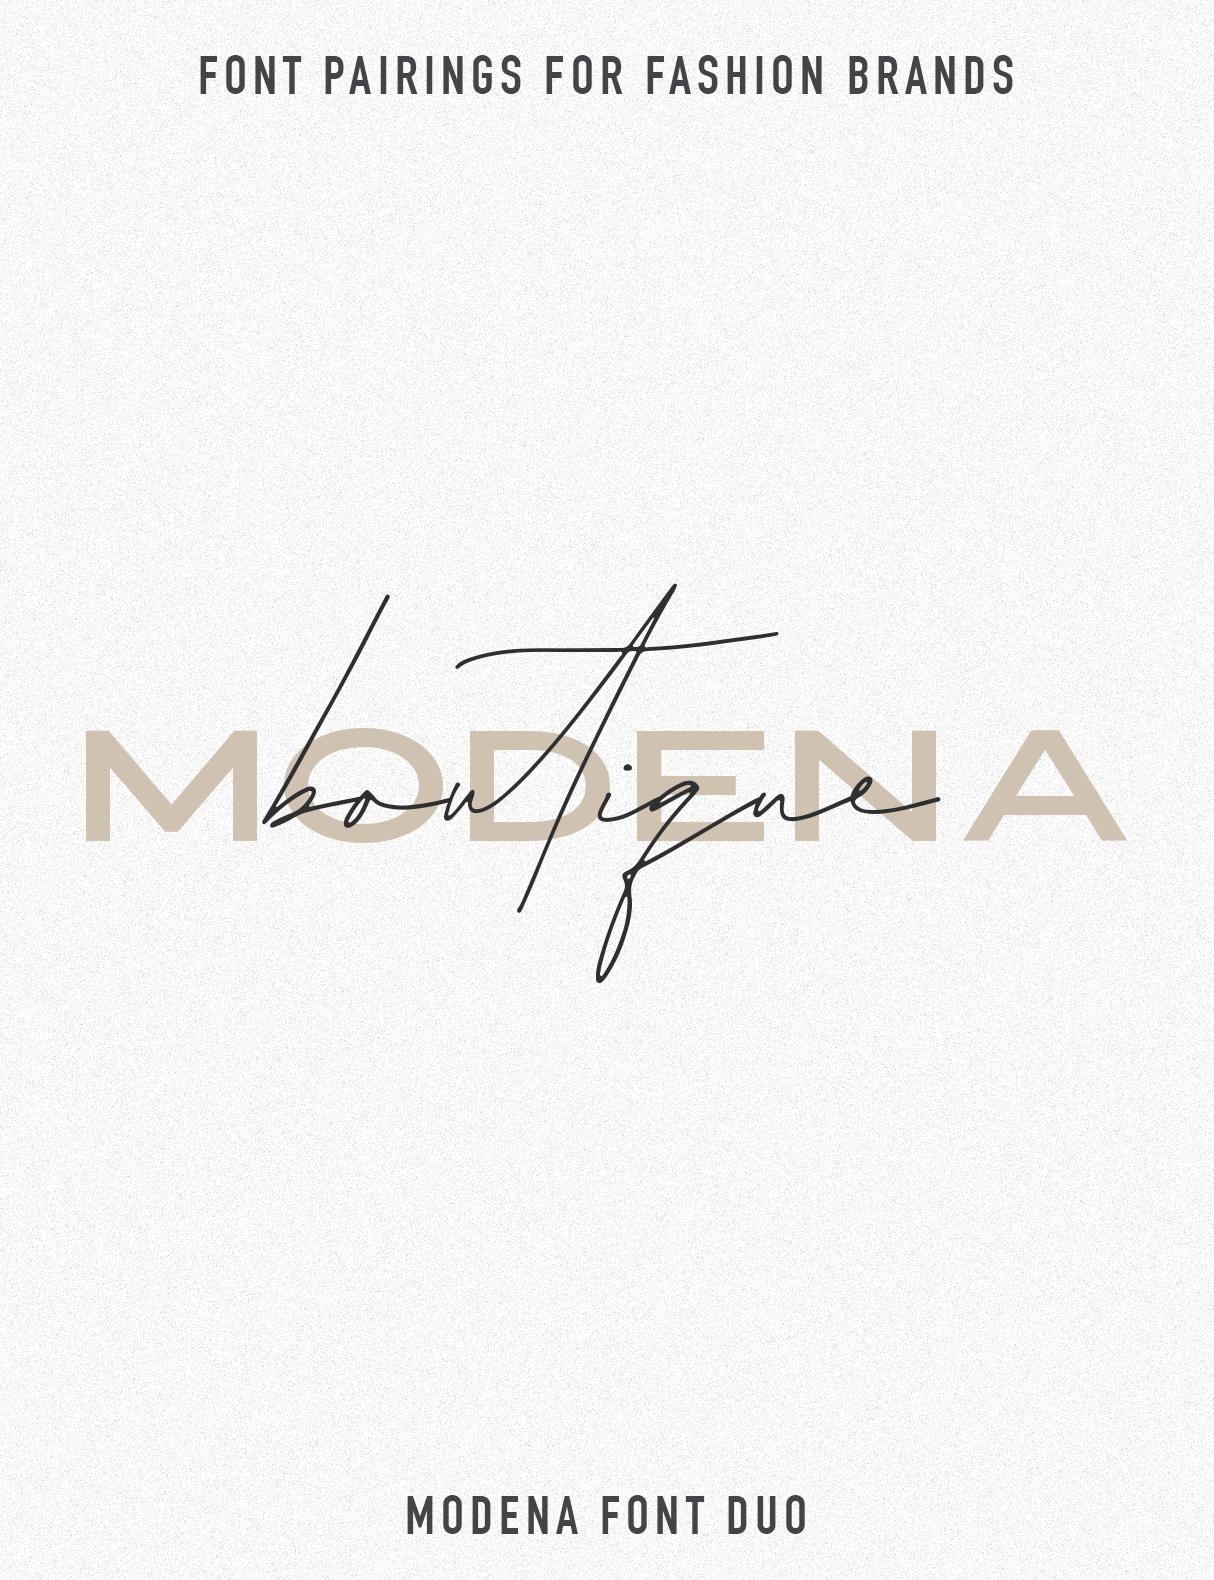 Jen Wagner Fashion Brand Font Pairings | Modena